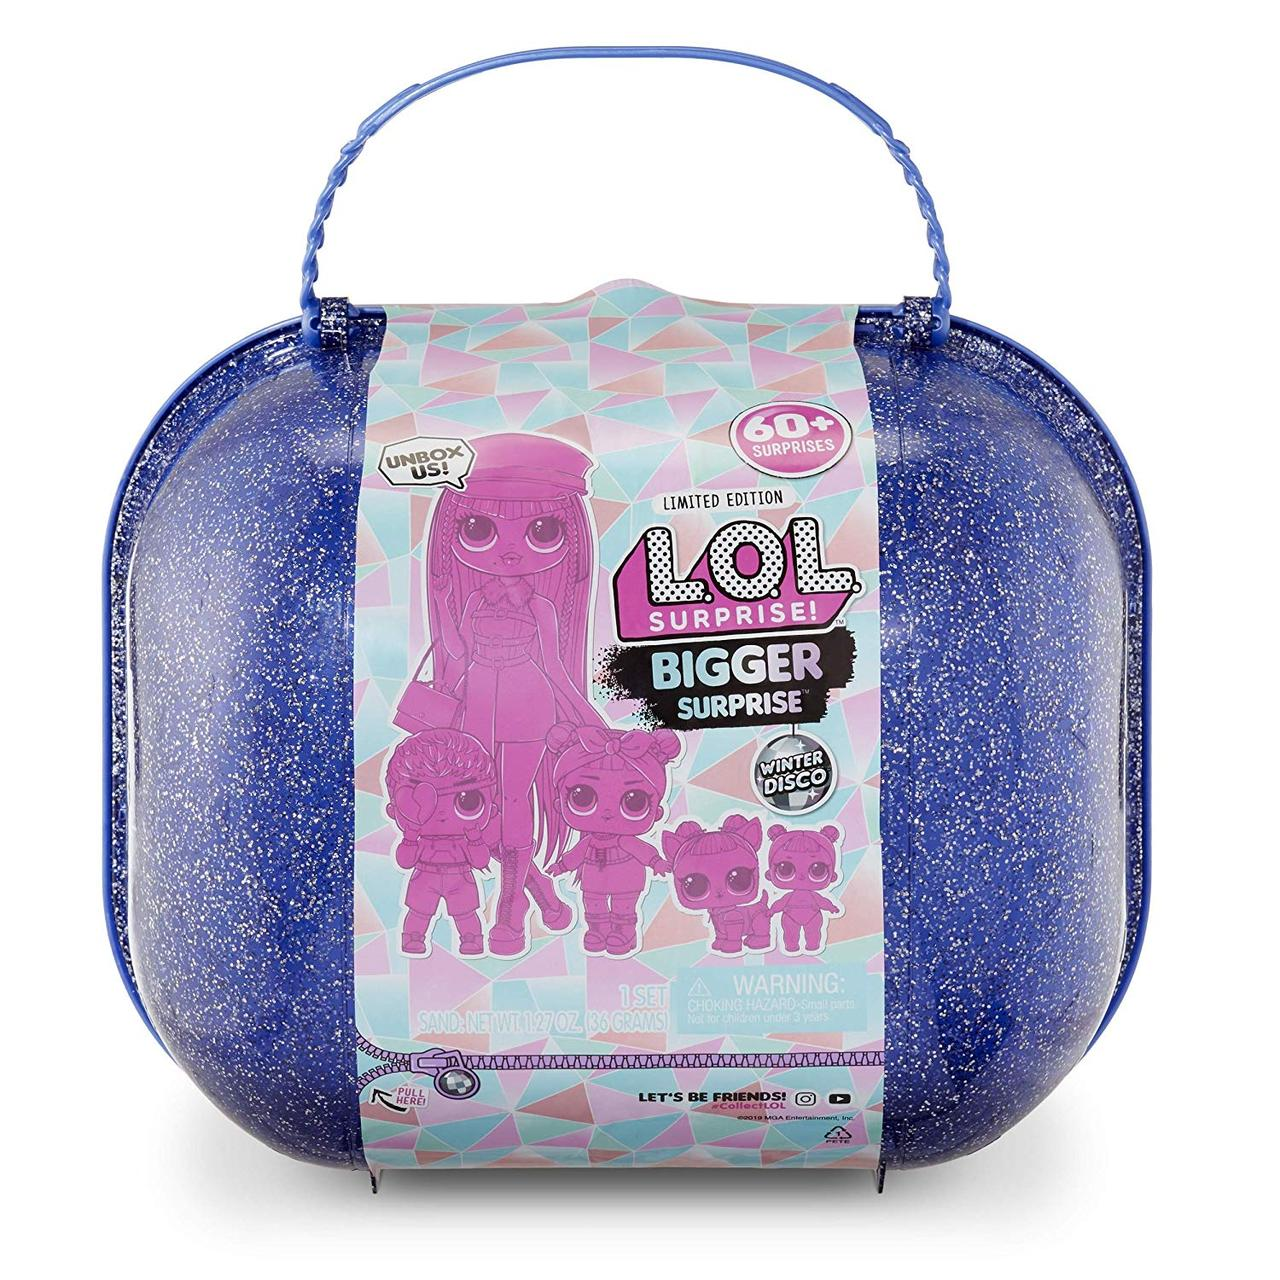 L. O. L. Surprise! S6 Зимовий диско валіза великий сюрприз Winter Disco Bigger Surprise O. M. G. Fashion